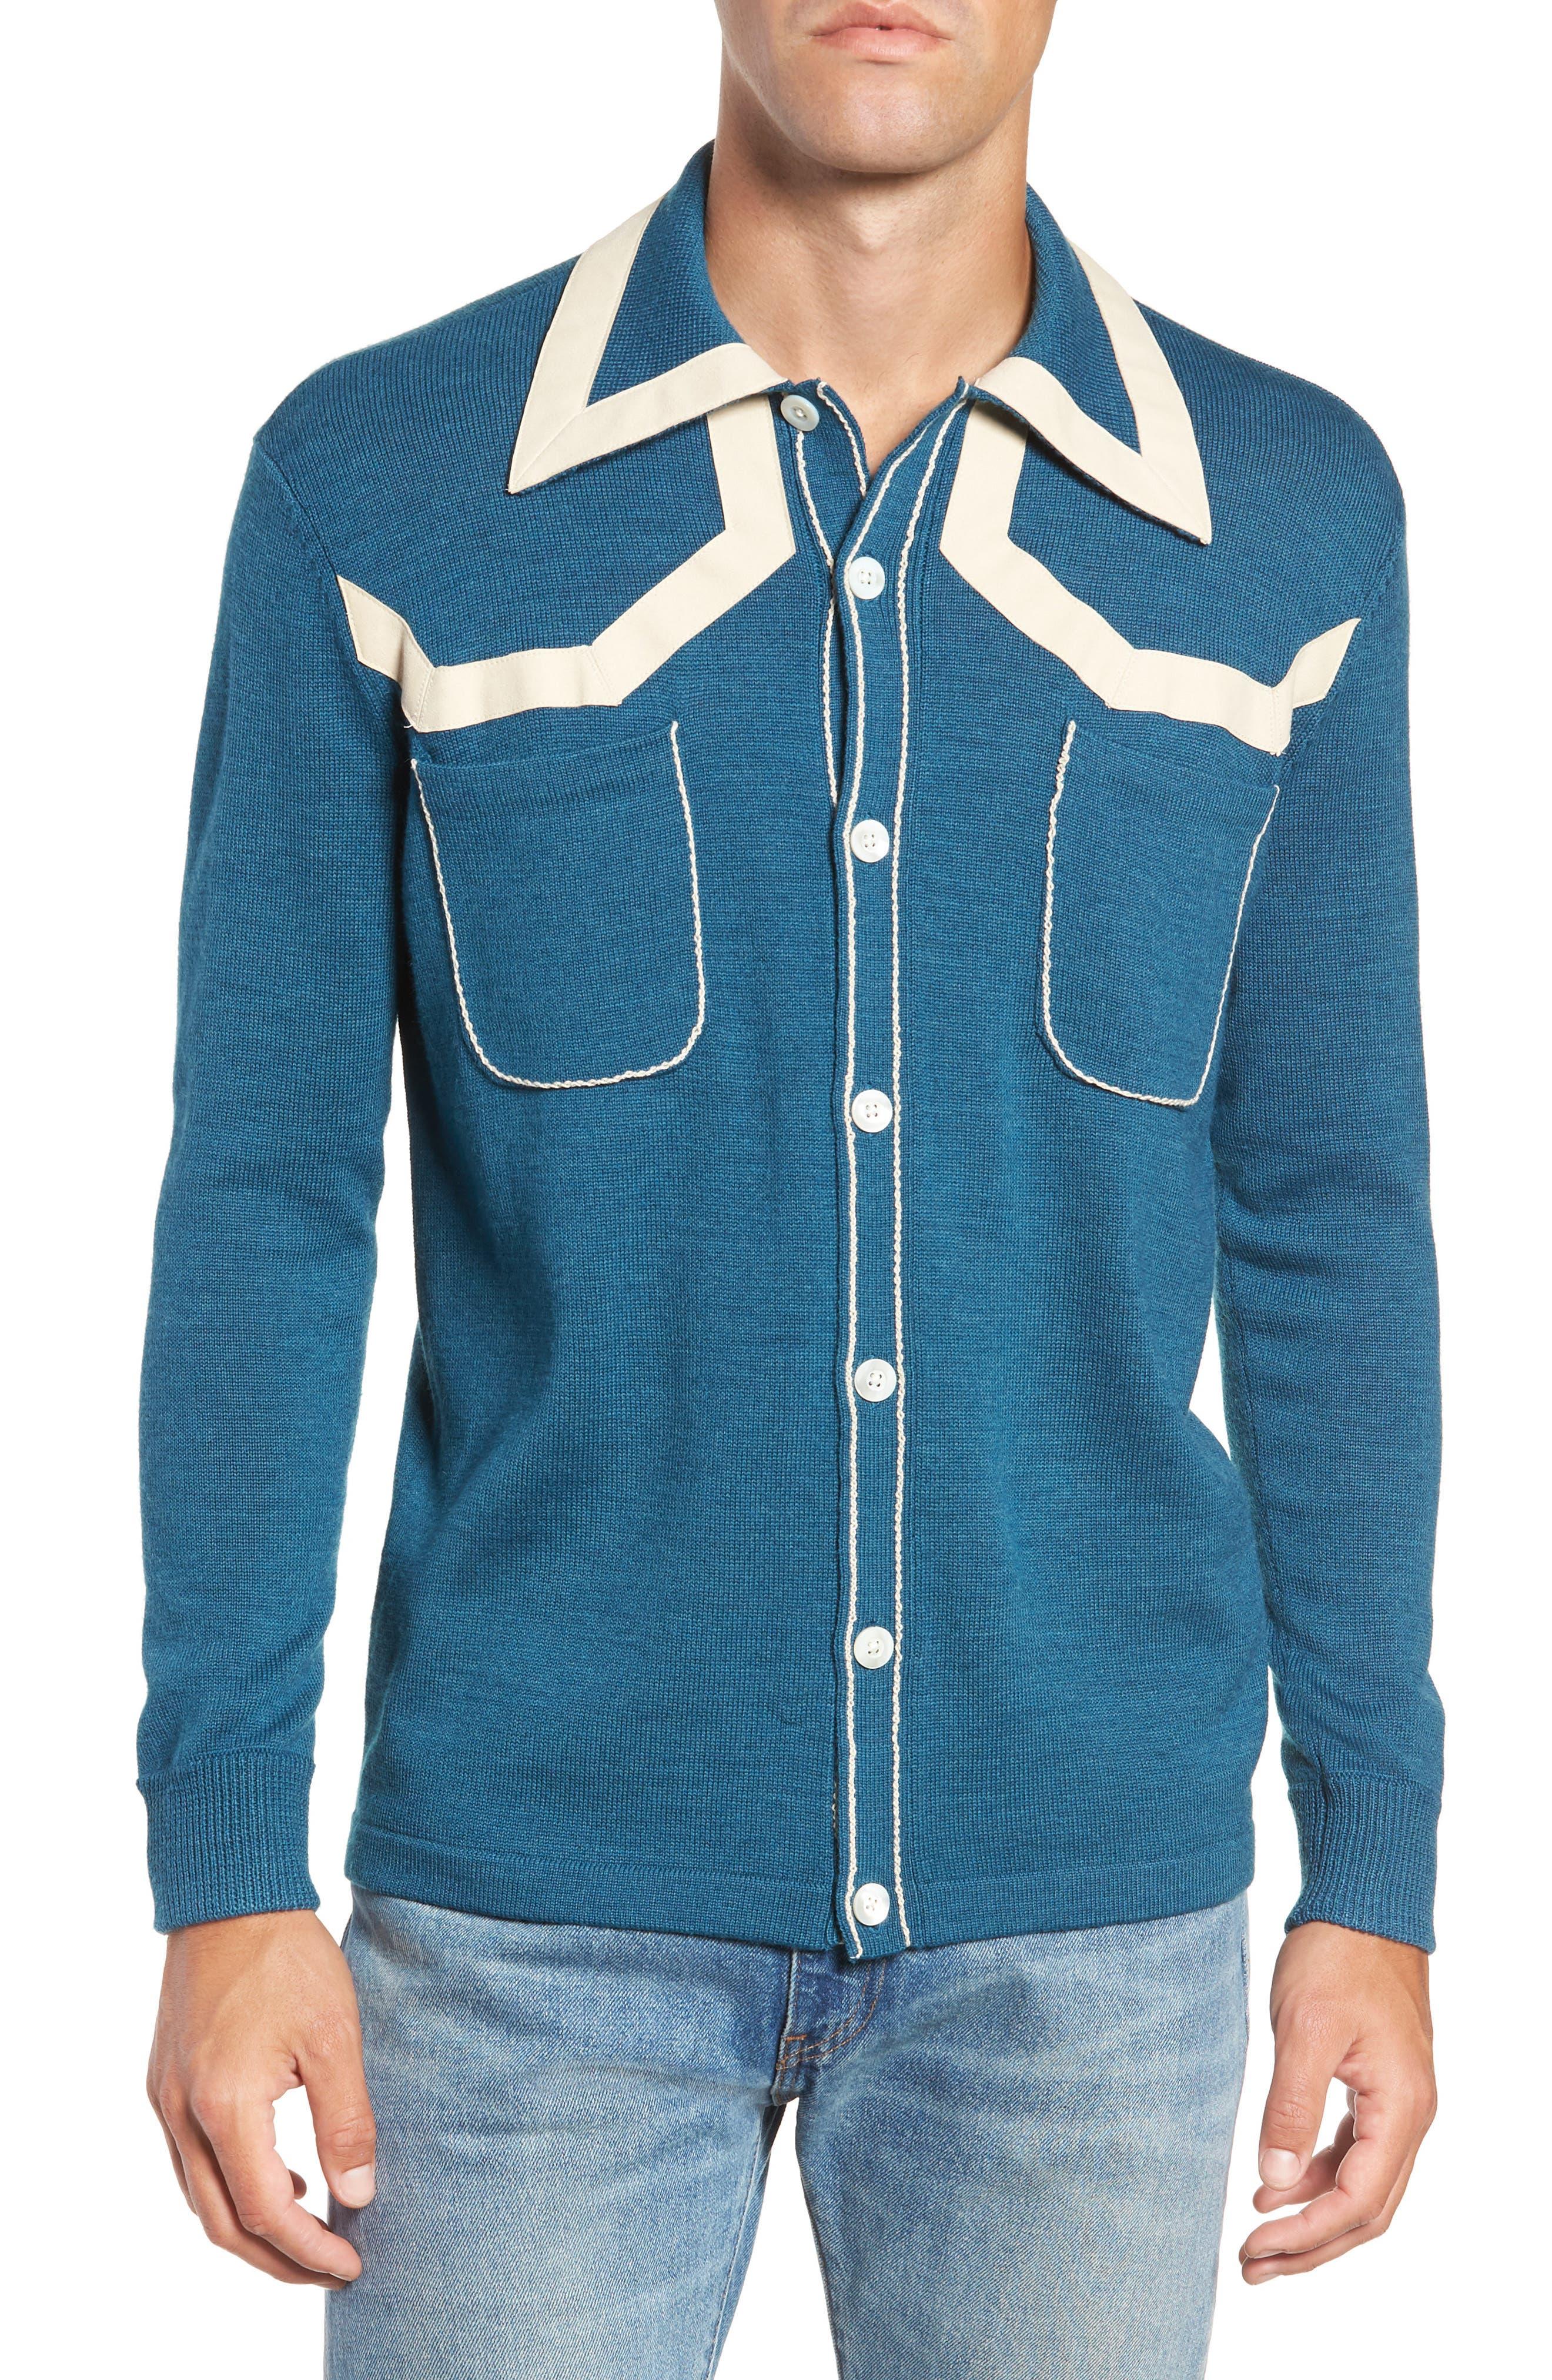 1940s Style Mens Shirts, Sweaters, Vests Mens Levis Vintage Clothing Isaac Knit Shirt $77.98 AT vintagedancer.com